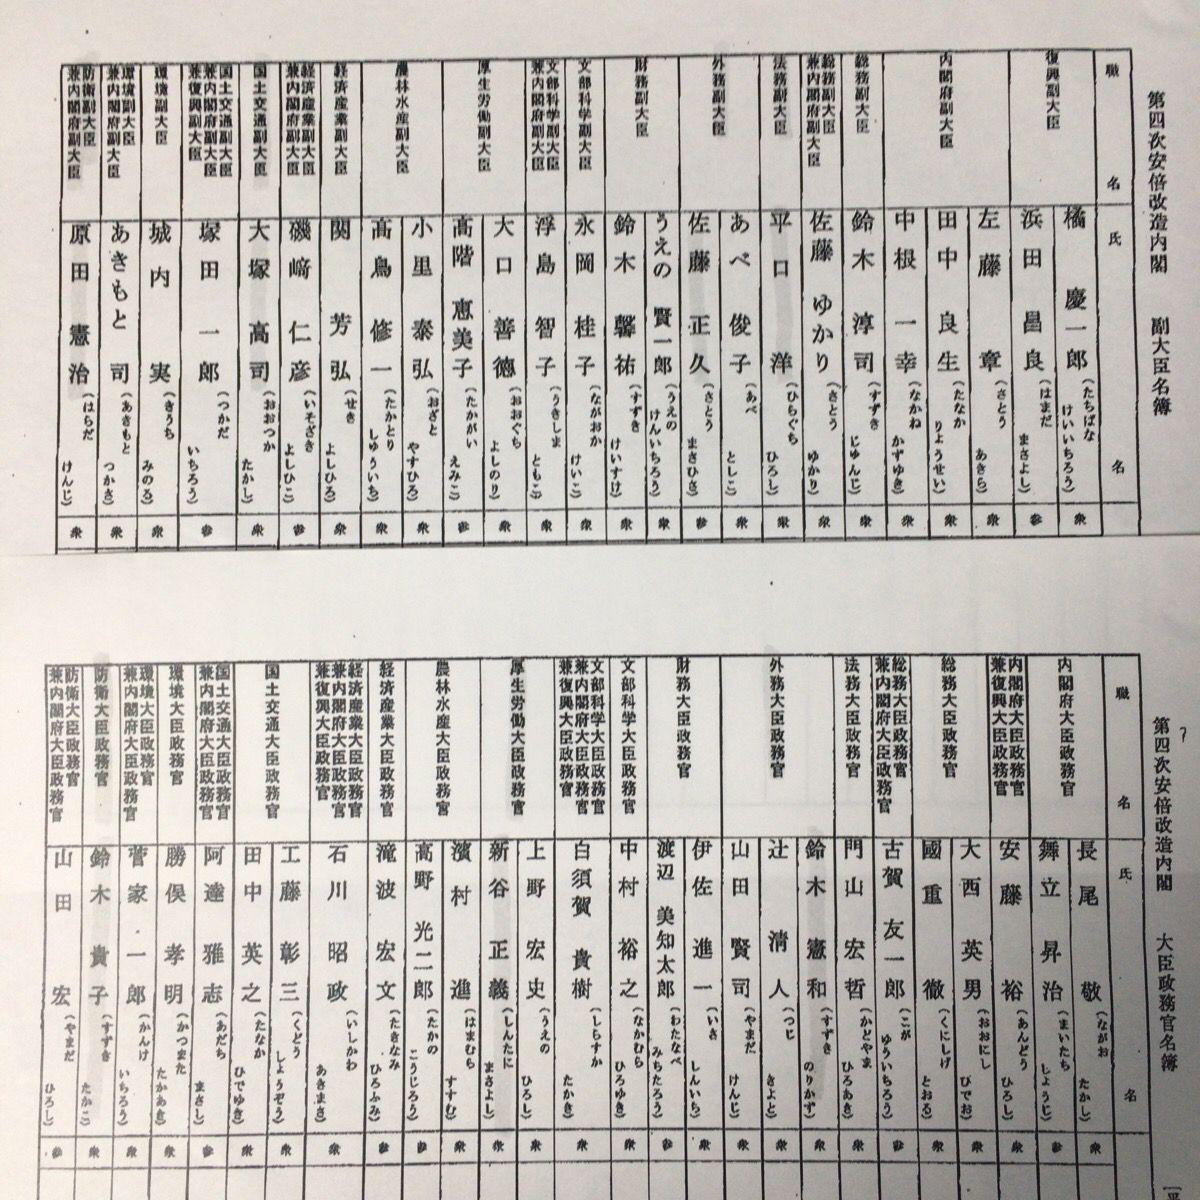 A5E0C90B-9978-49F2-AD02-D230D168559C